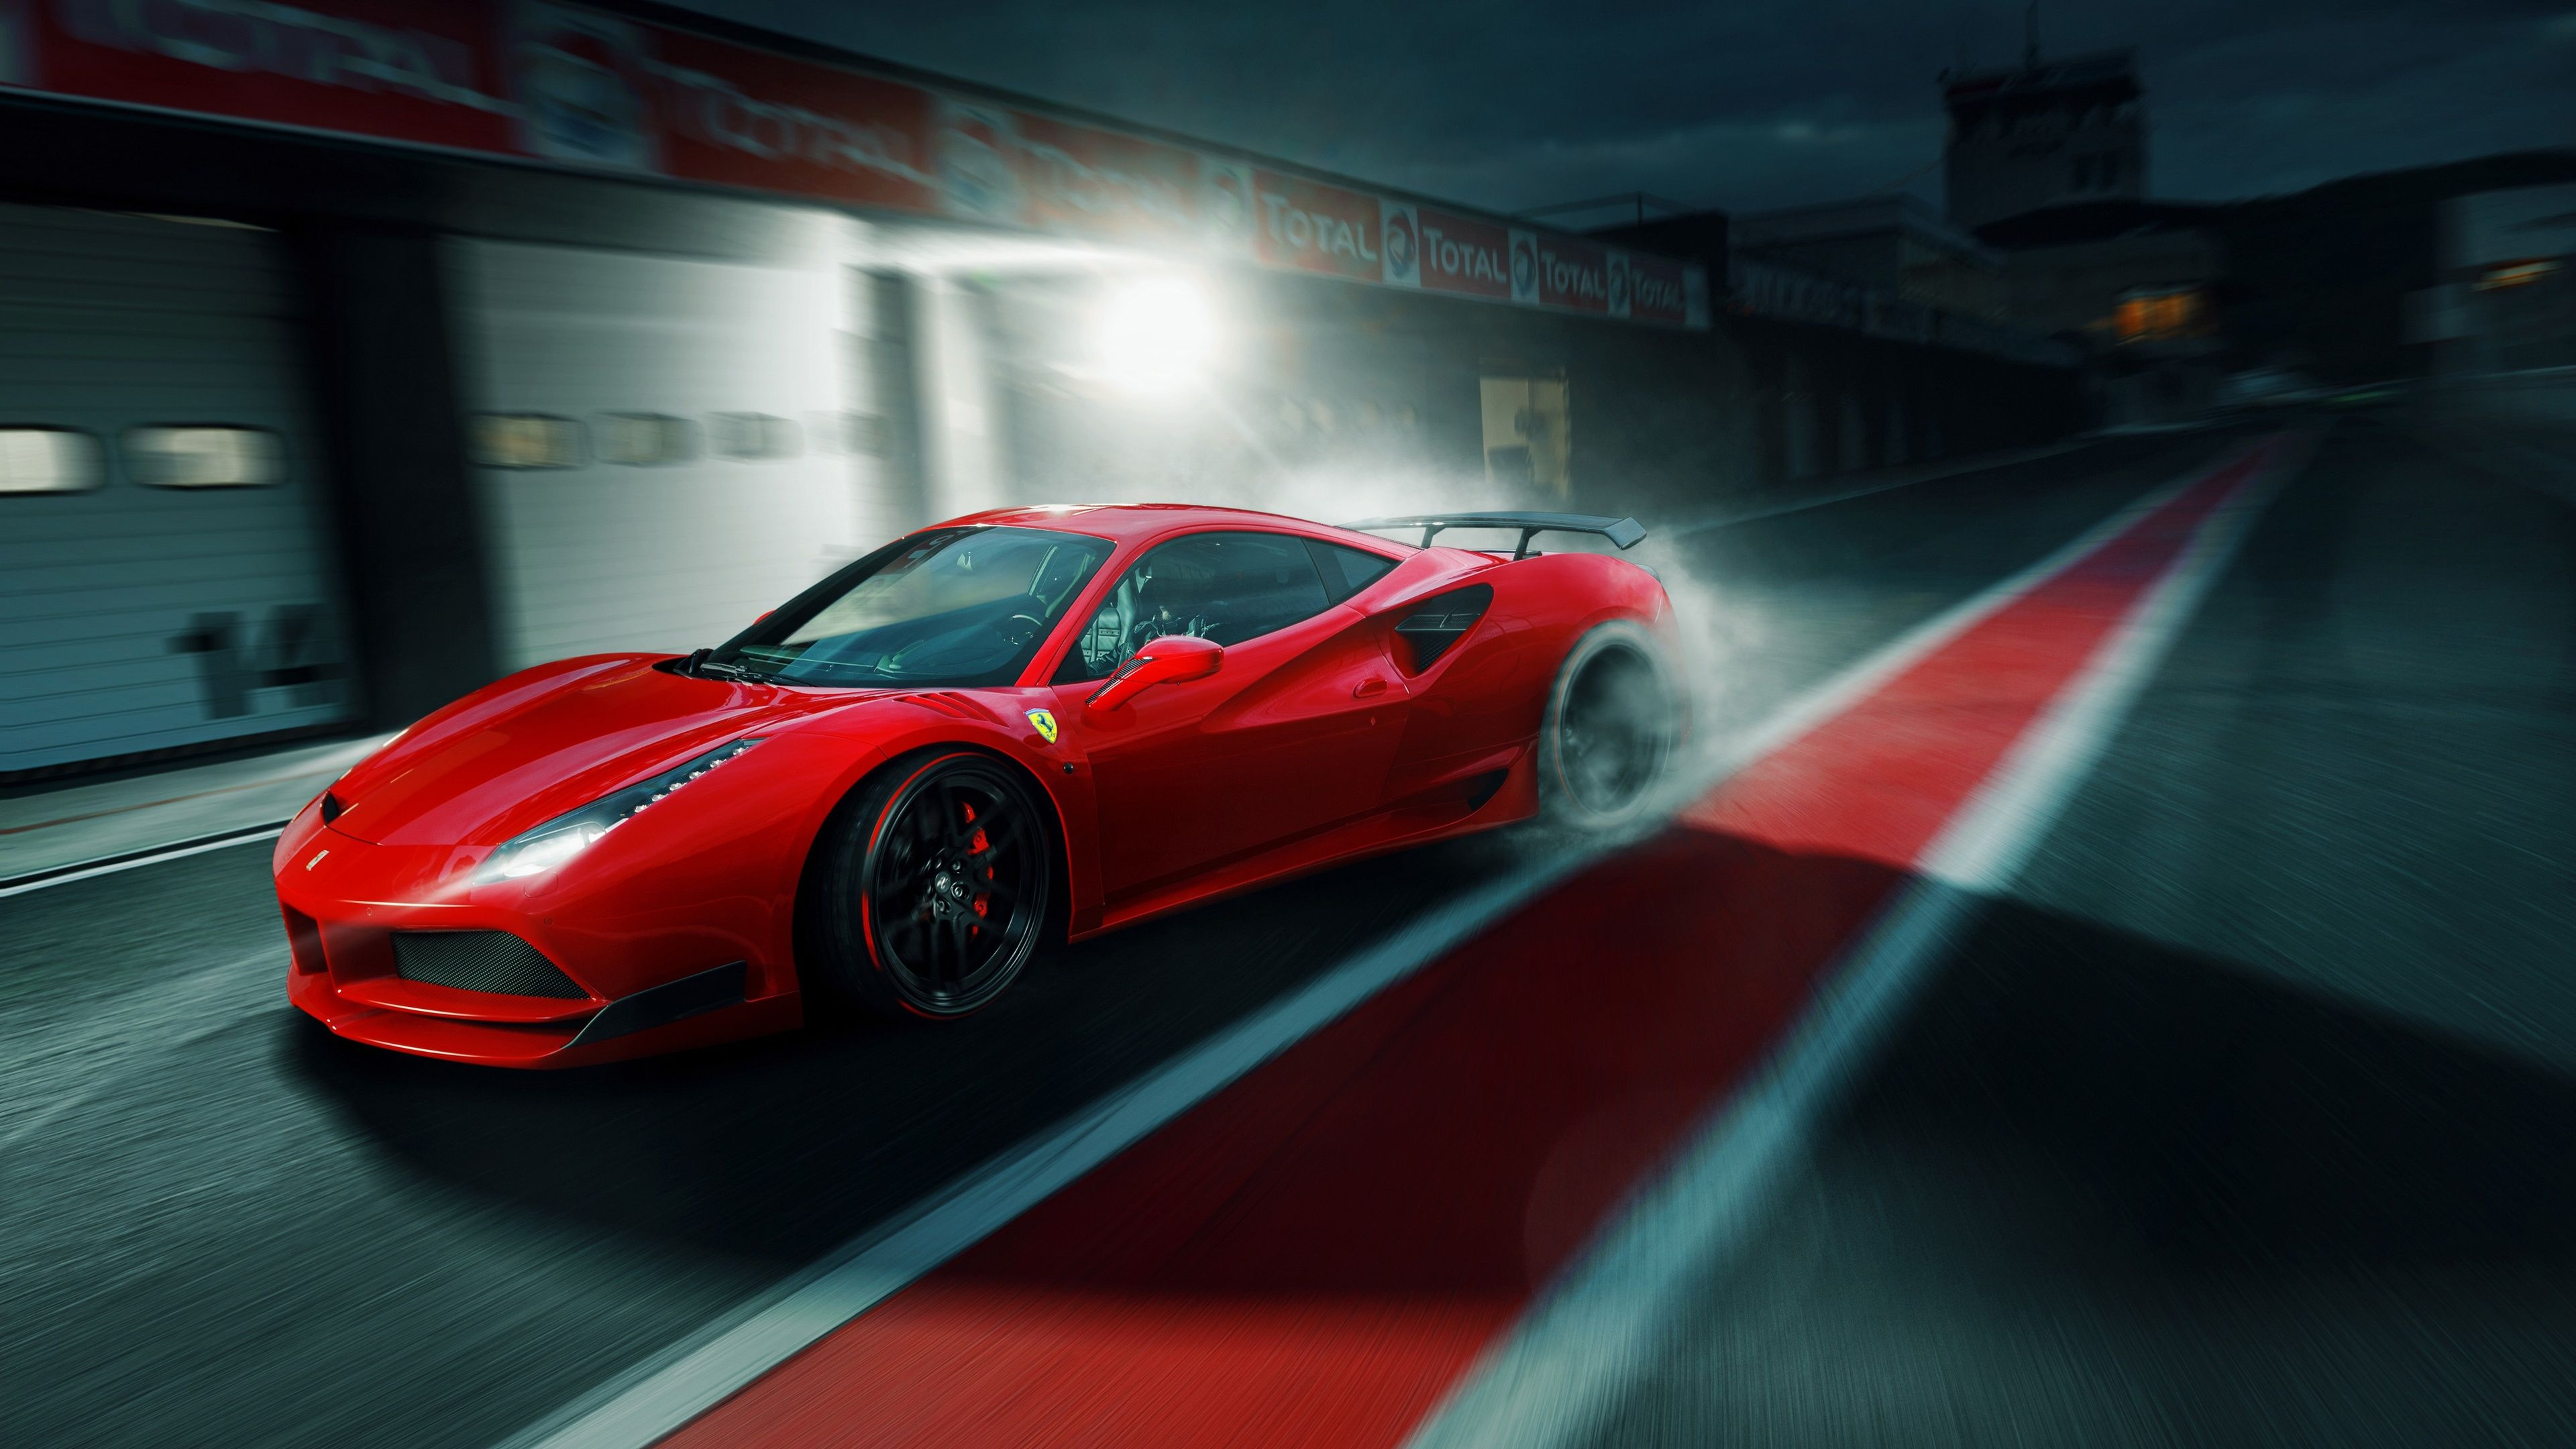 2017 Ferrari 488 Gtb Hd Wallpapers Ferrari Wallpapers Ferrari 488 Wallpapers 4k Wallpapers 2017 Cars Wallpapers Ferrari 488 Ferrari Red Sports Car